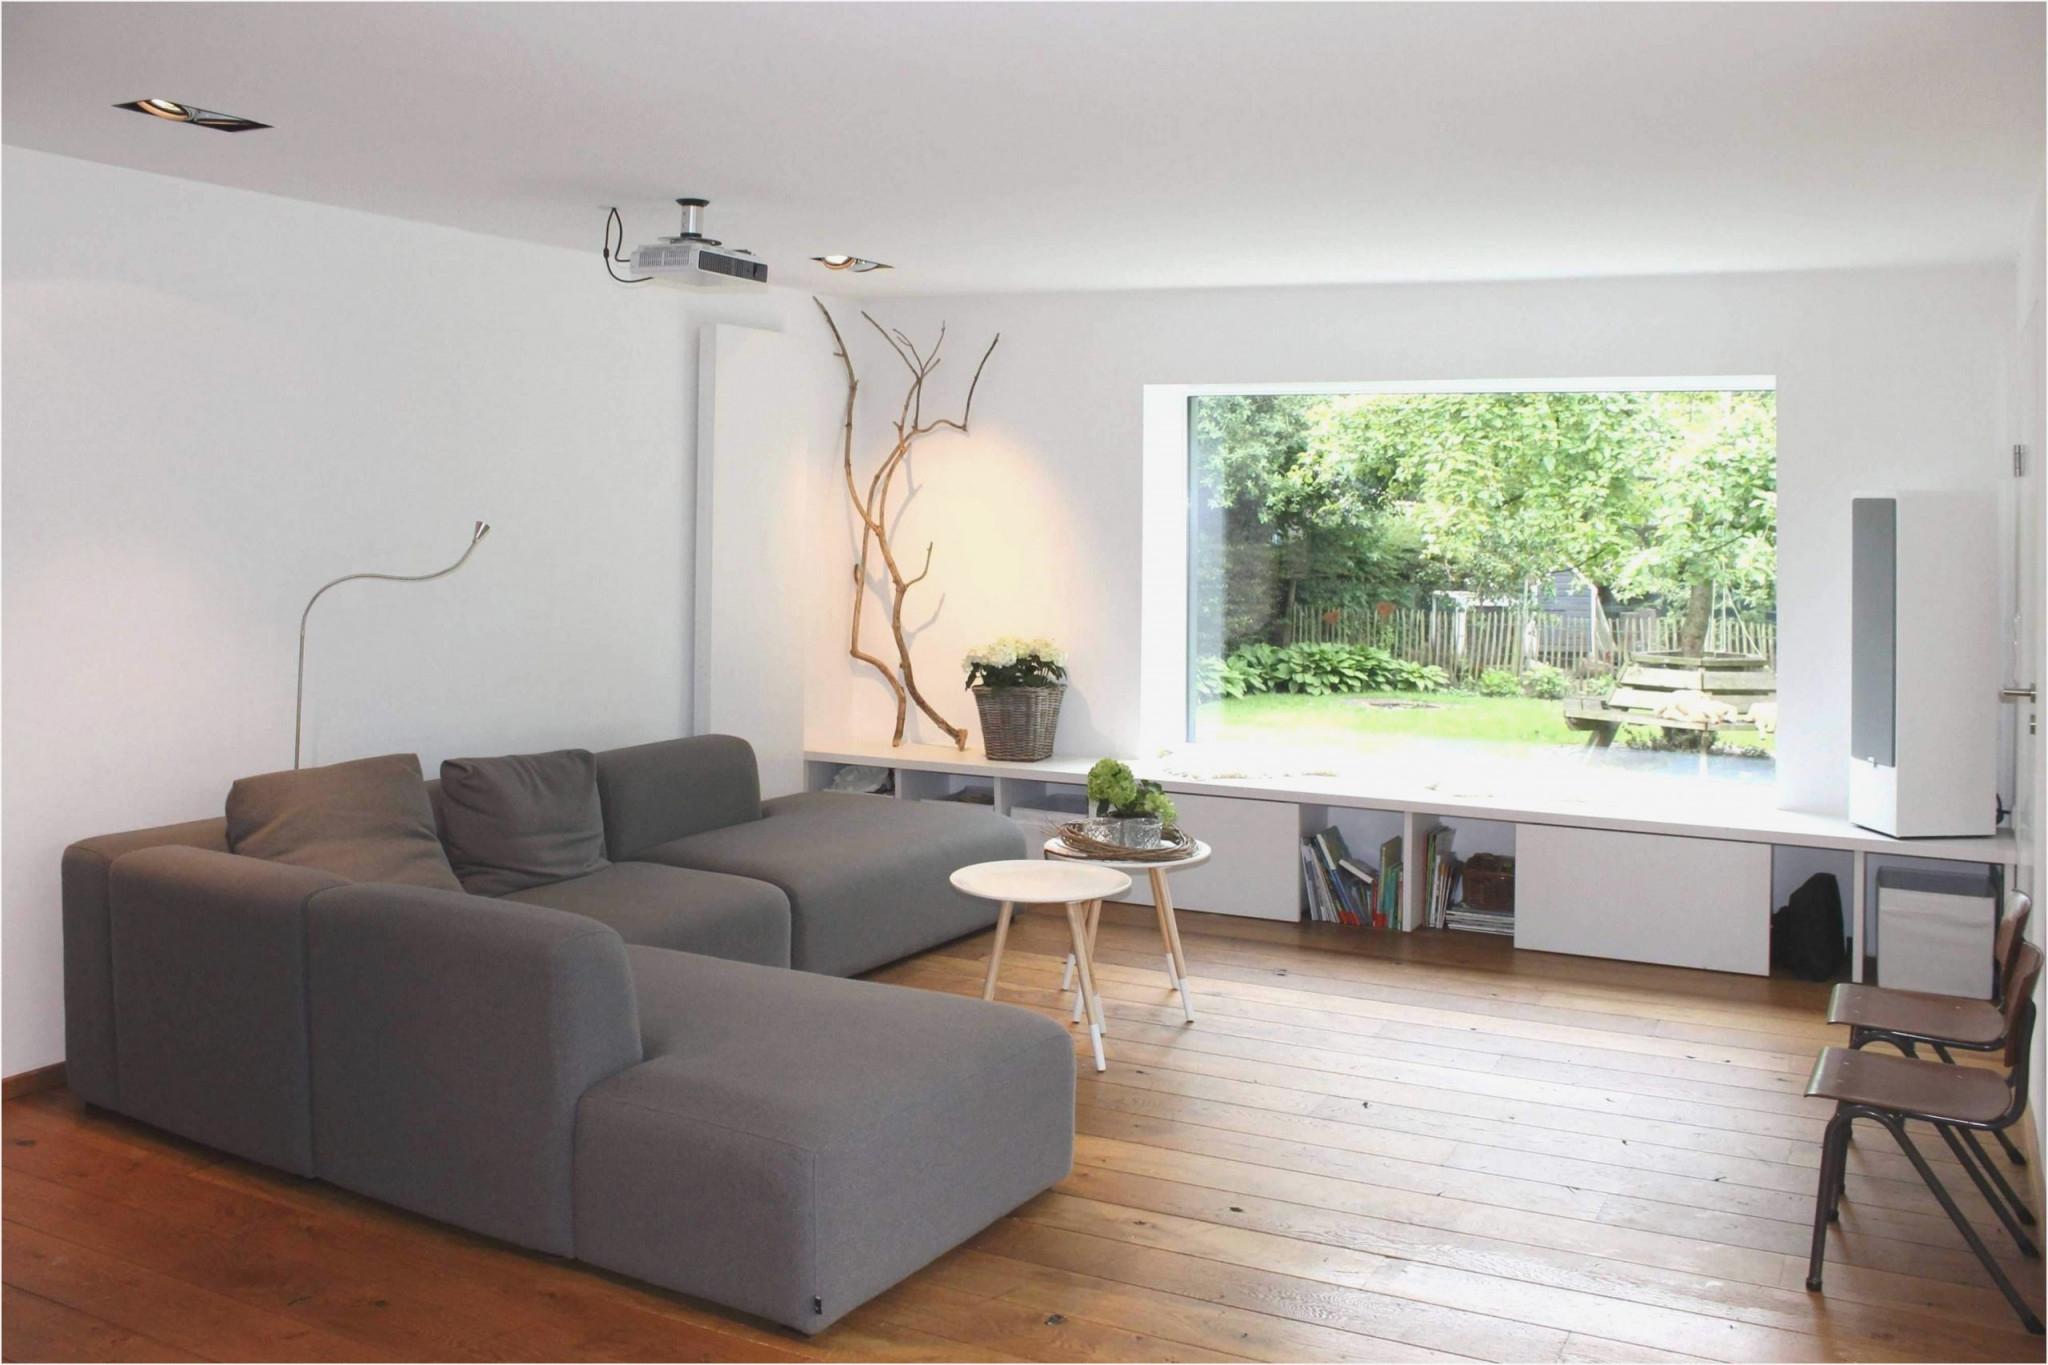 Wandfarbe Ideen Wohnzimmer Graues Sofa  Wohnzimmer von Wohnzimmer Sofa Ideen Photo